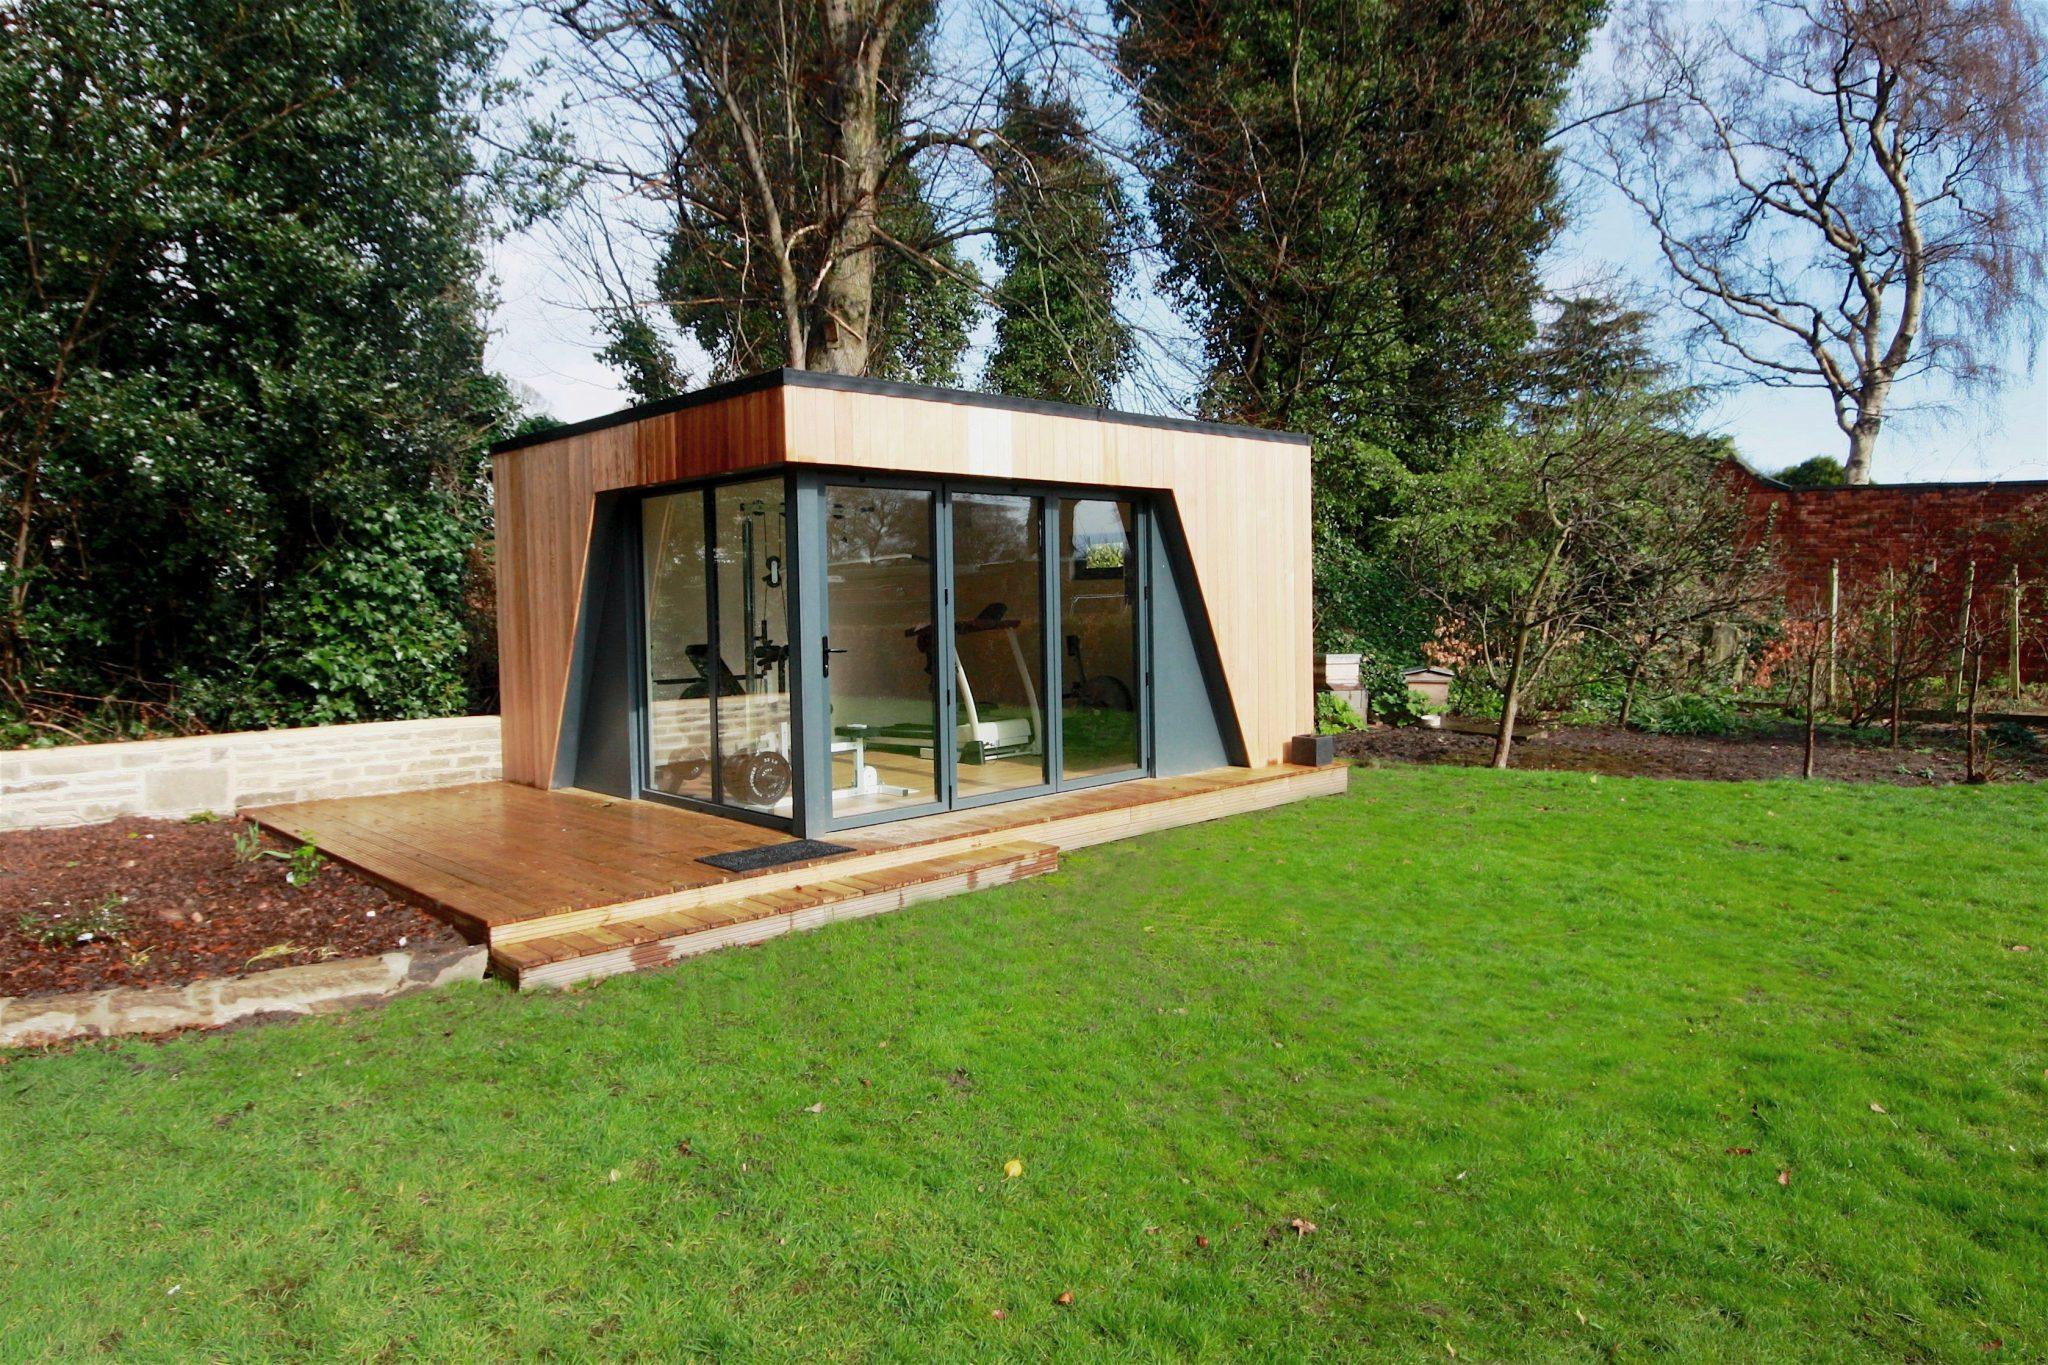 Garden rooms photo gallery of buildings by swift garden for Garden rooms cheshire